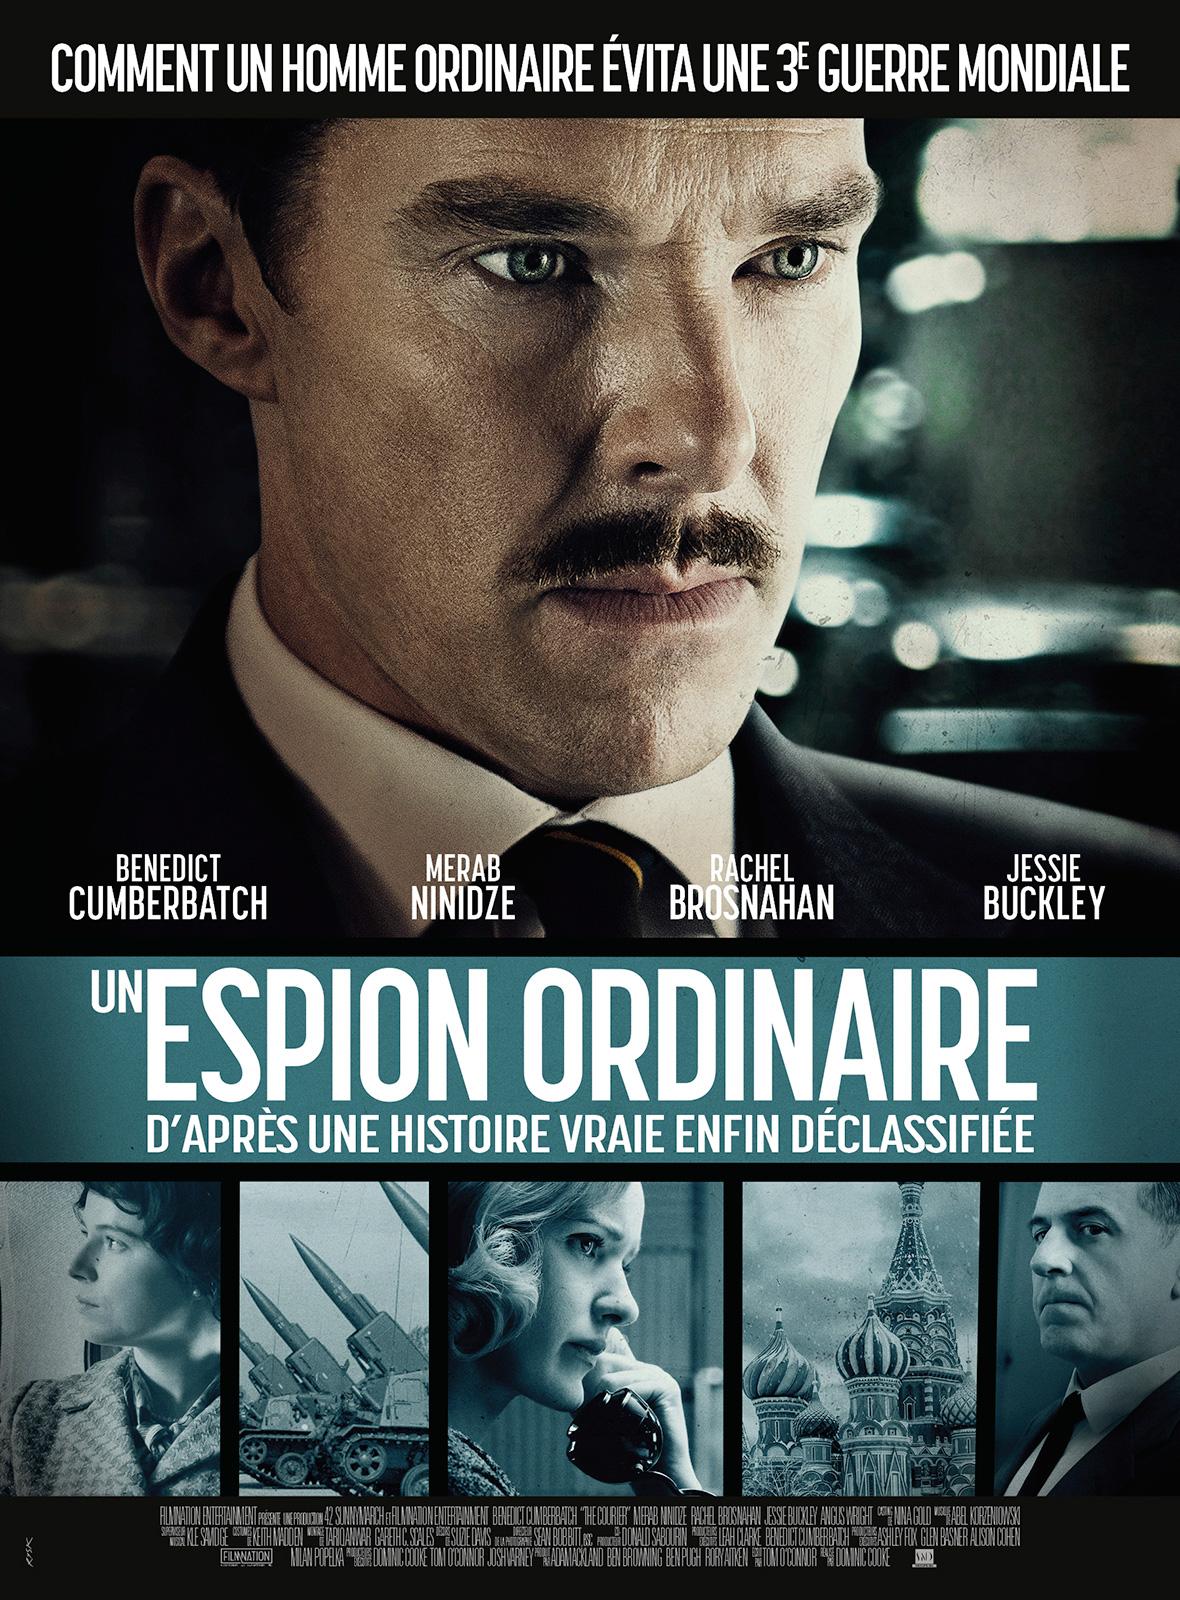 Un espion ordinaire - film 2021 - AlloCiné